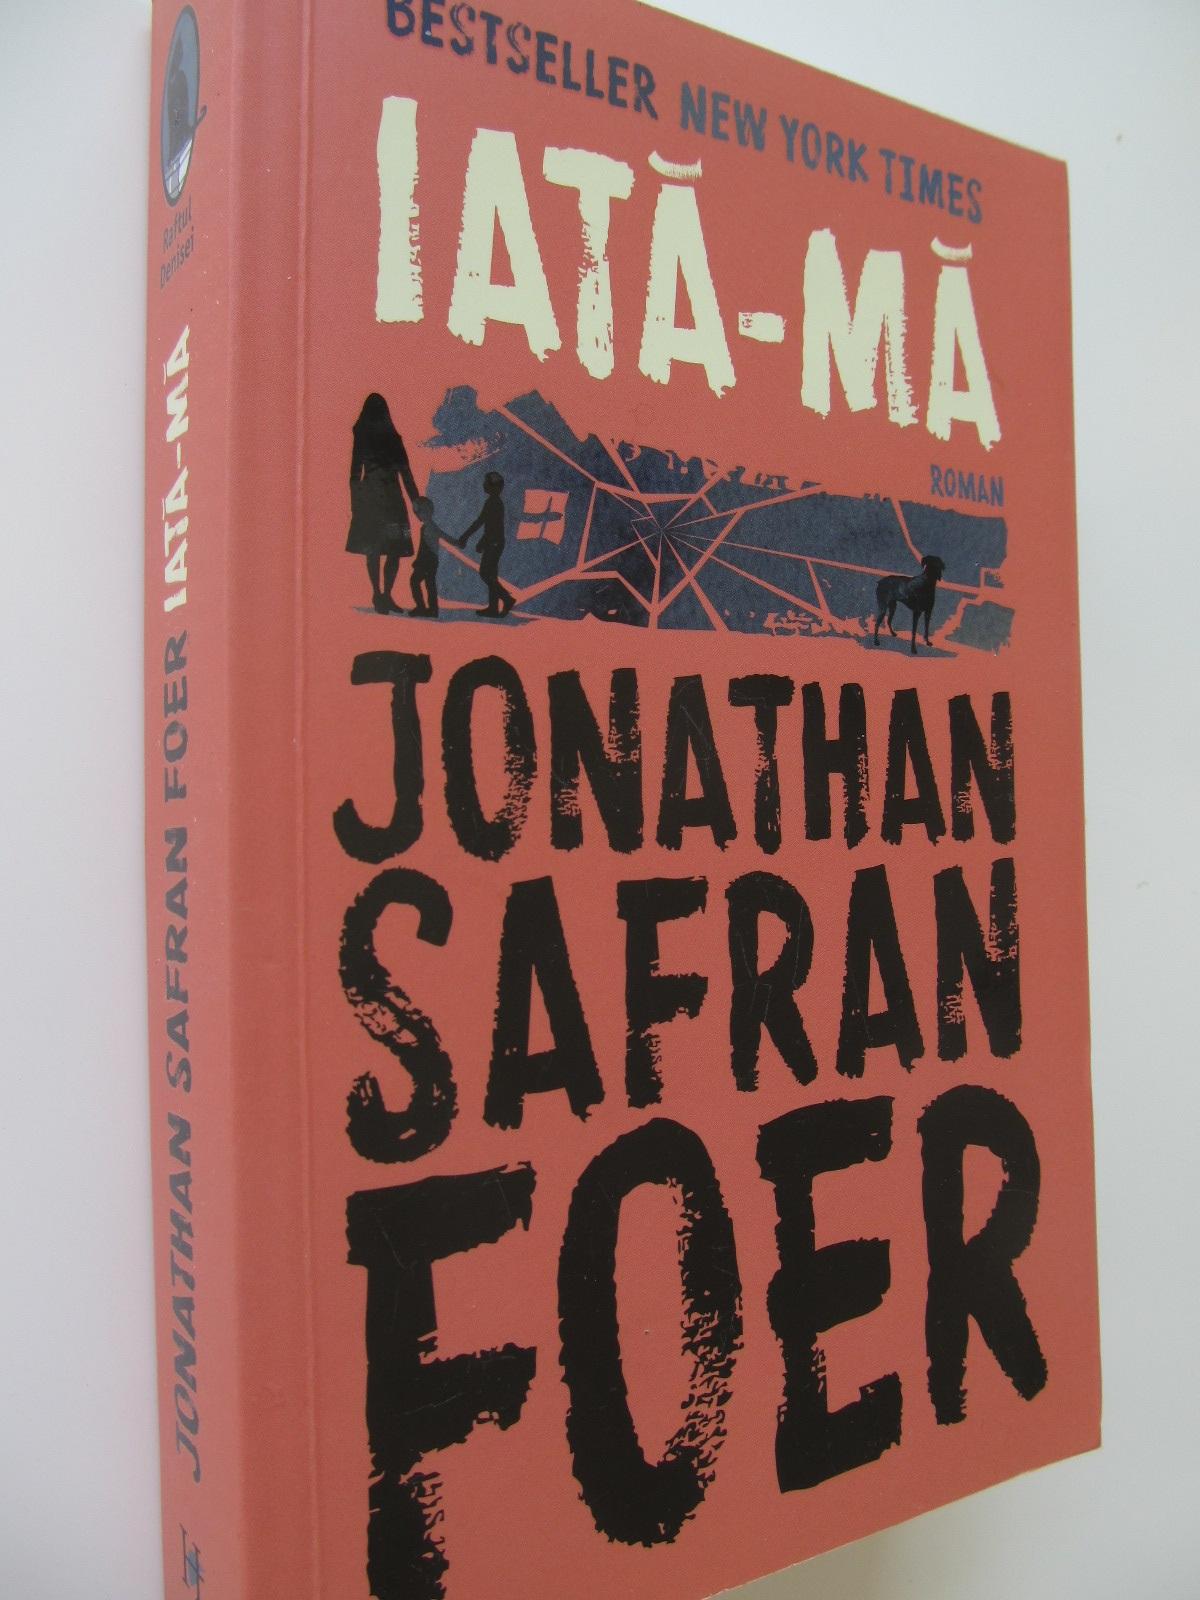 Carte Iata - ma - Jonathan Safran Foer